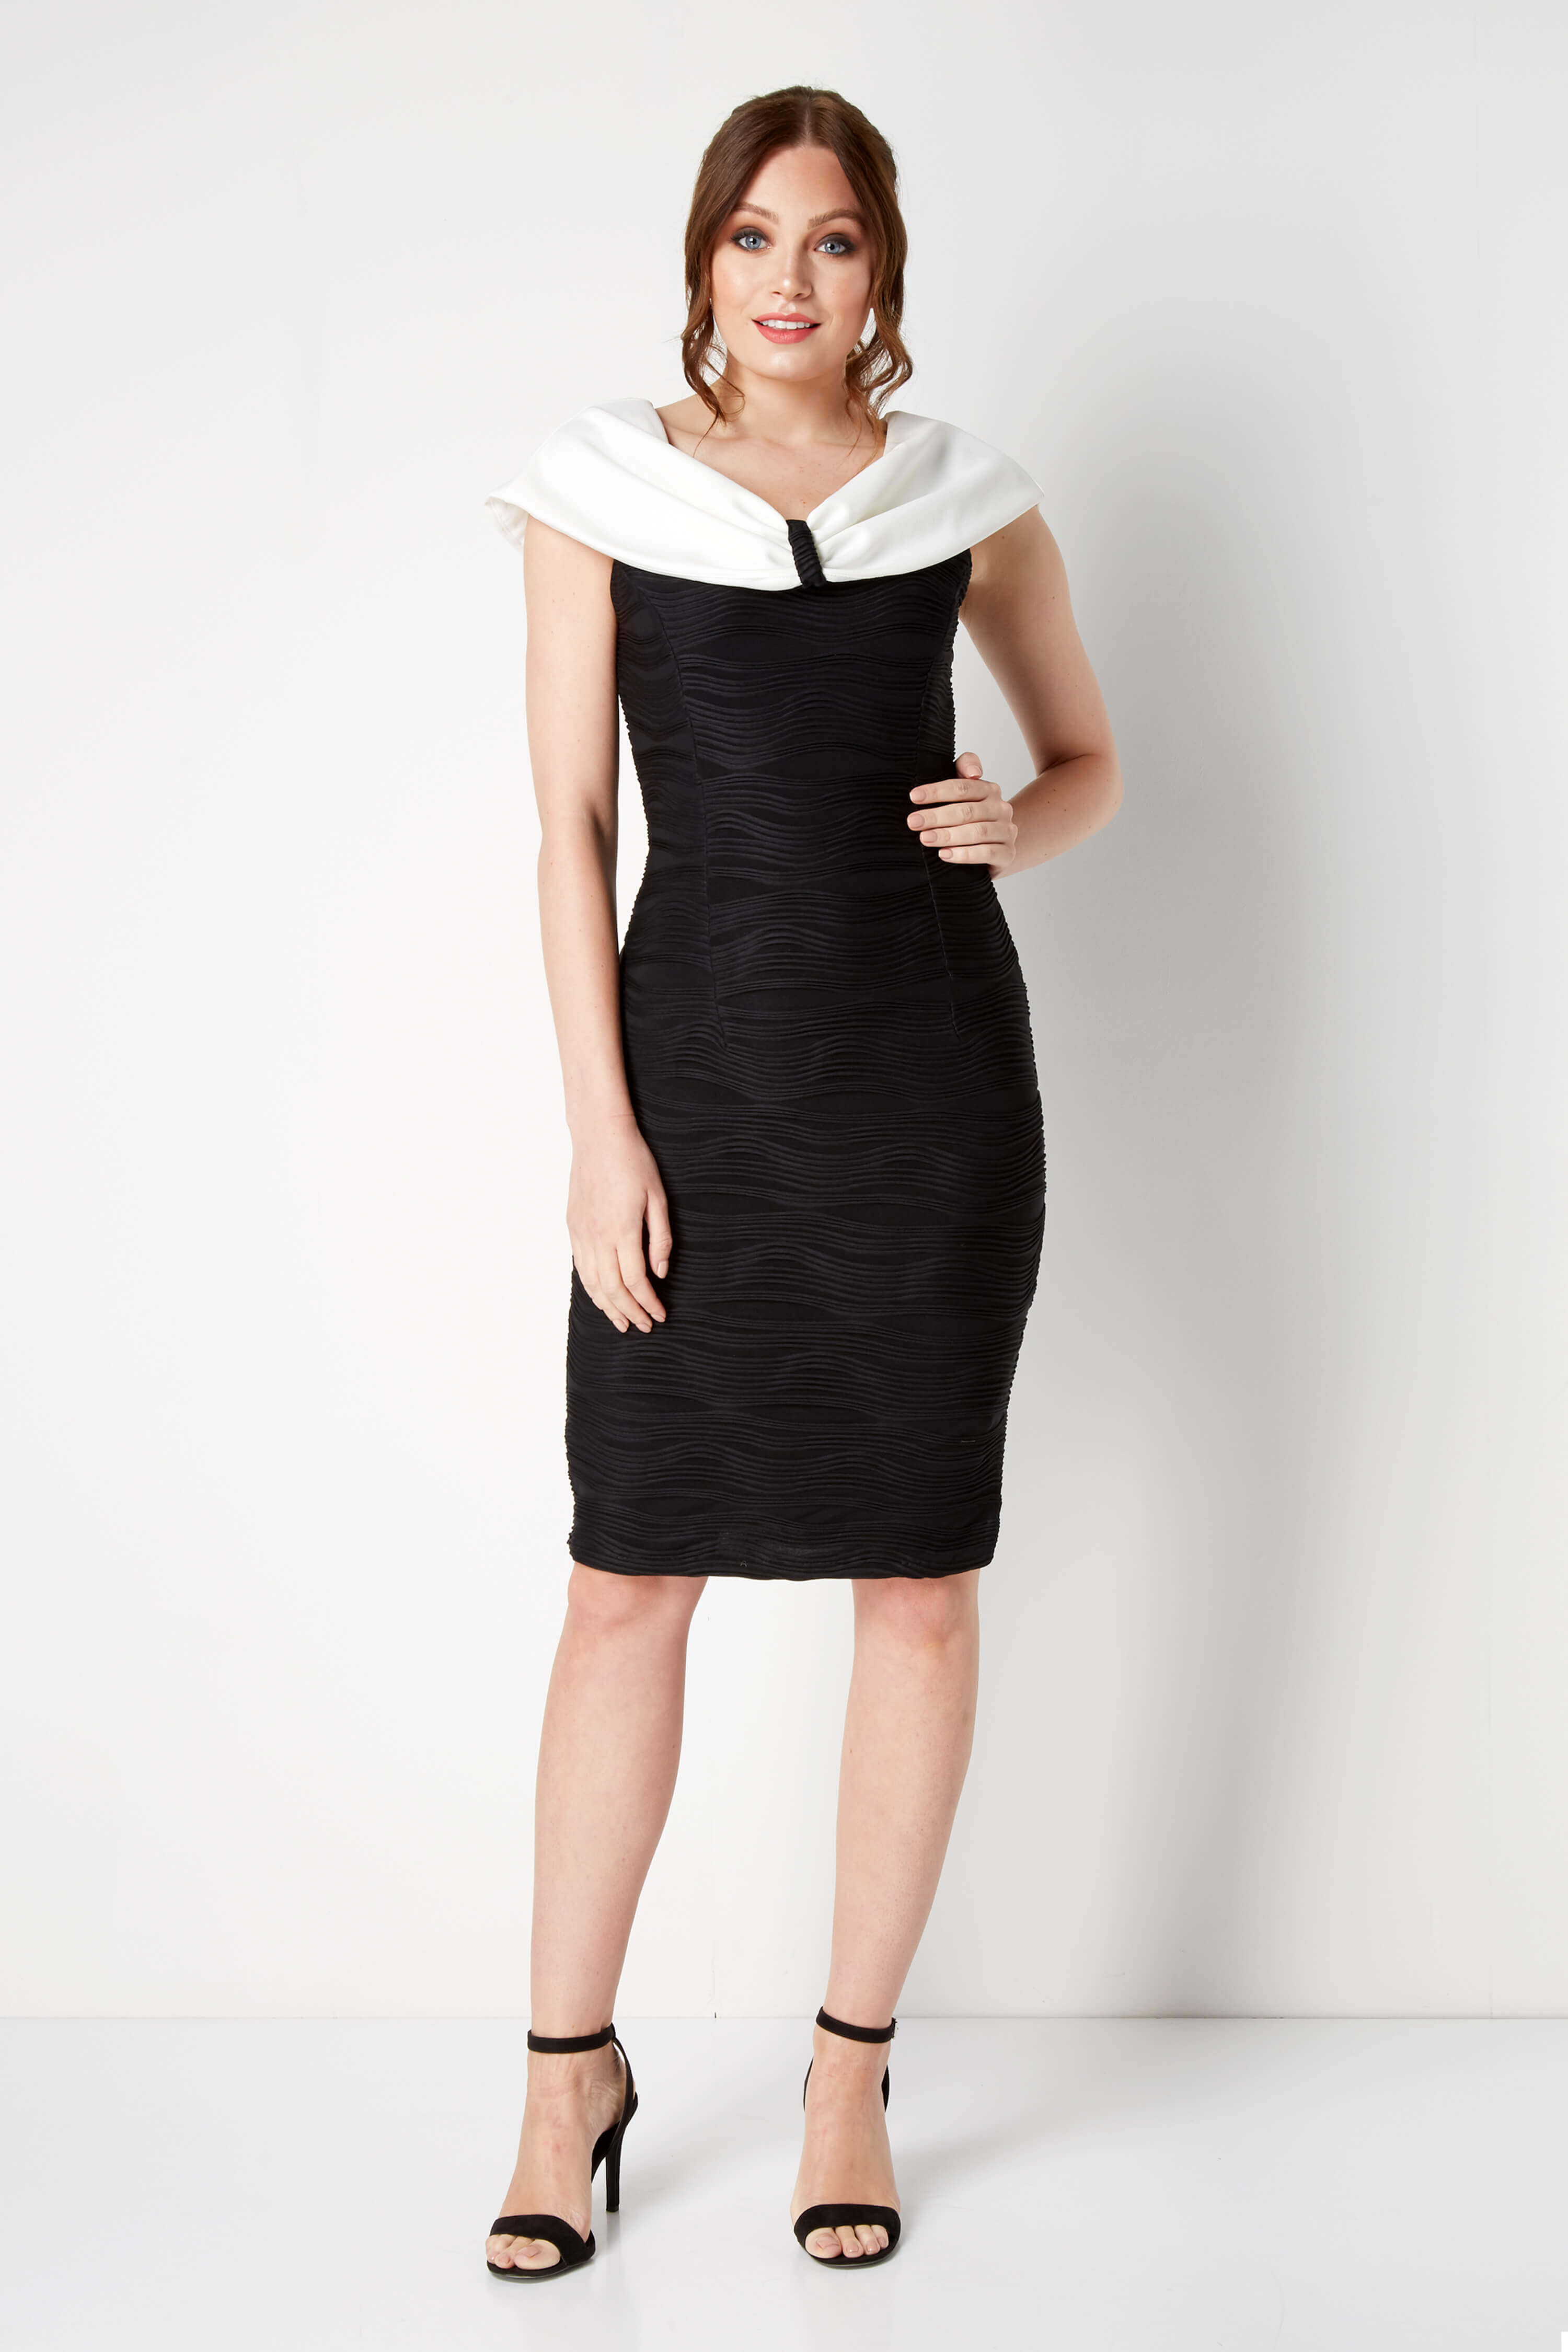 Roman Originals Contrast Bow Collar Dress in Black